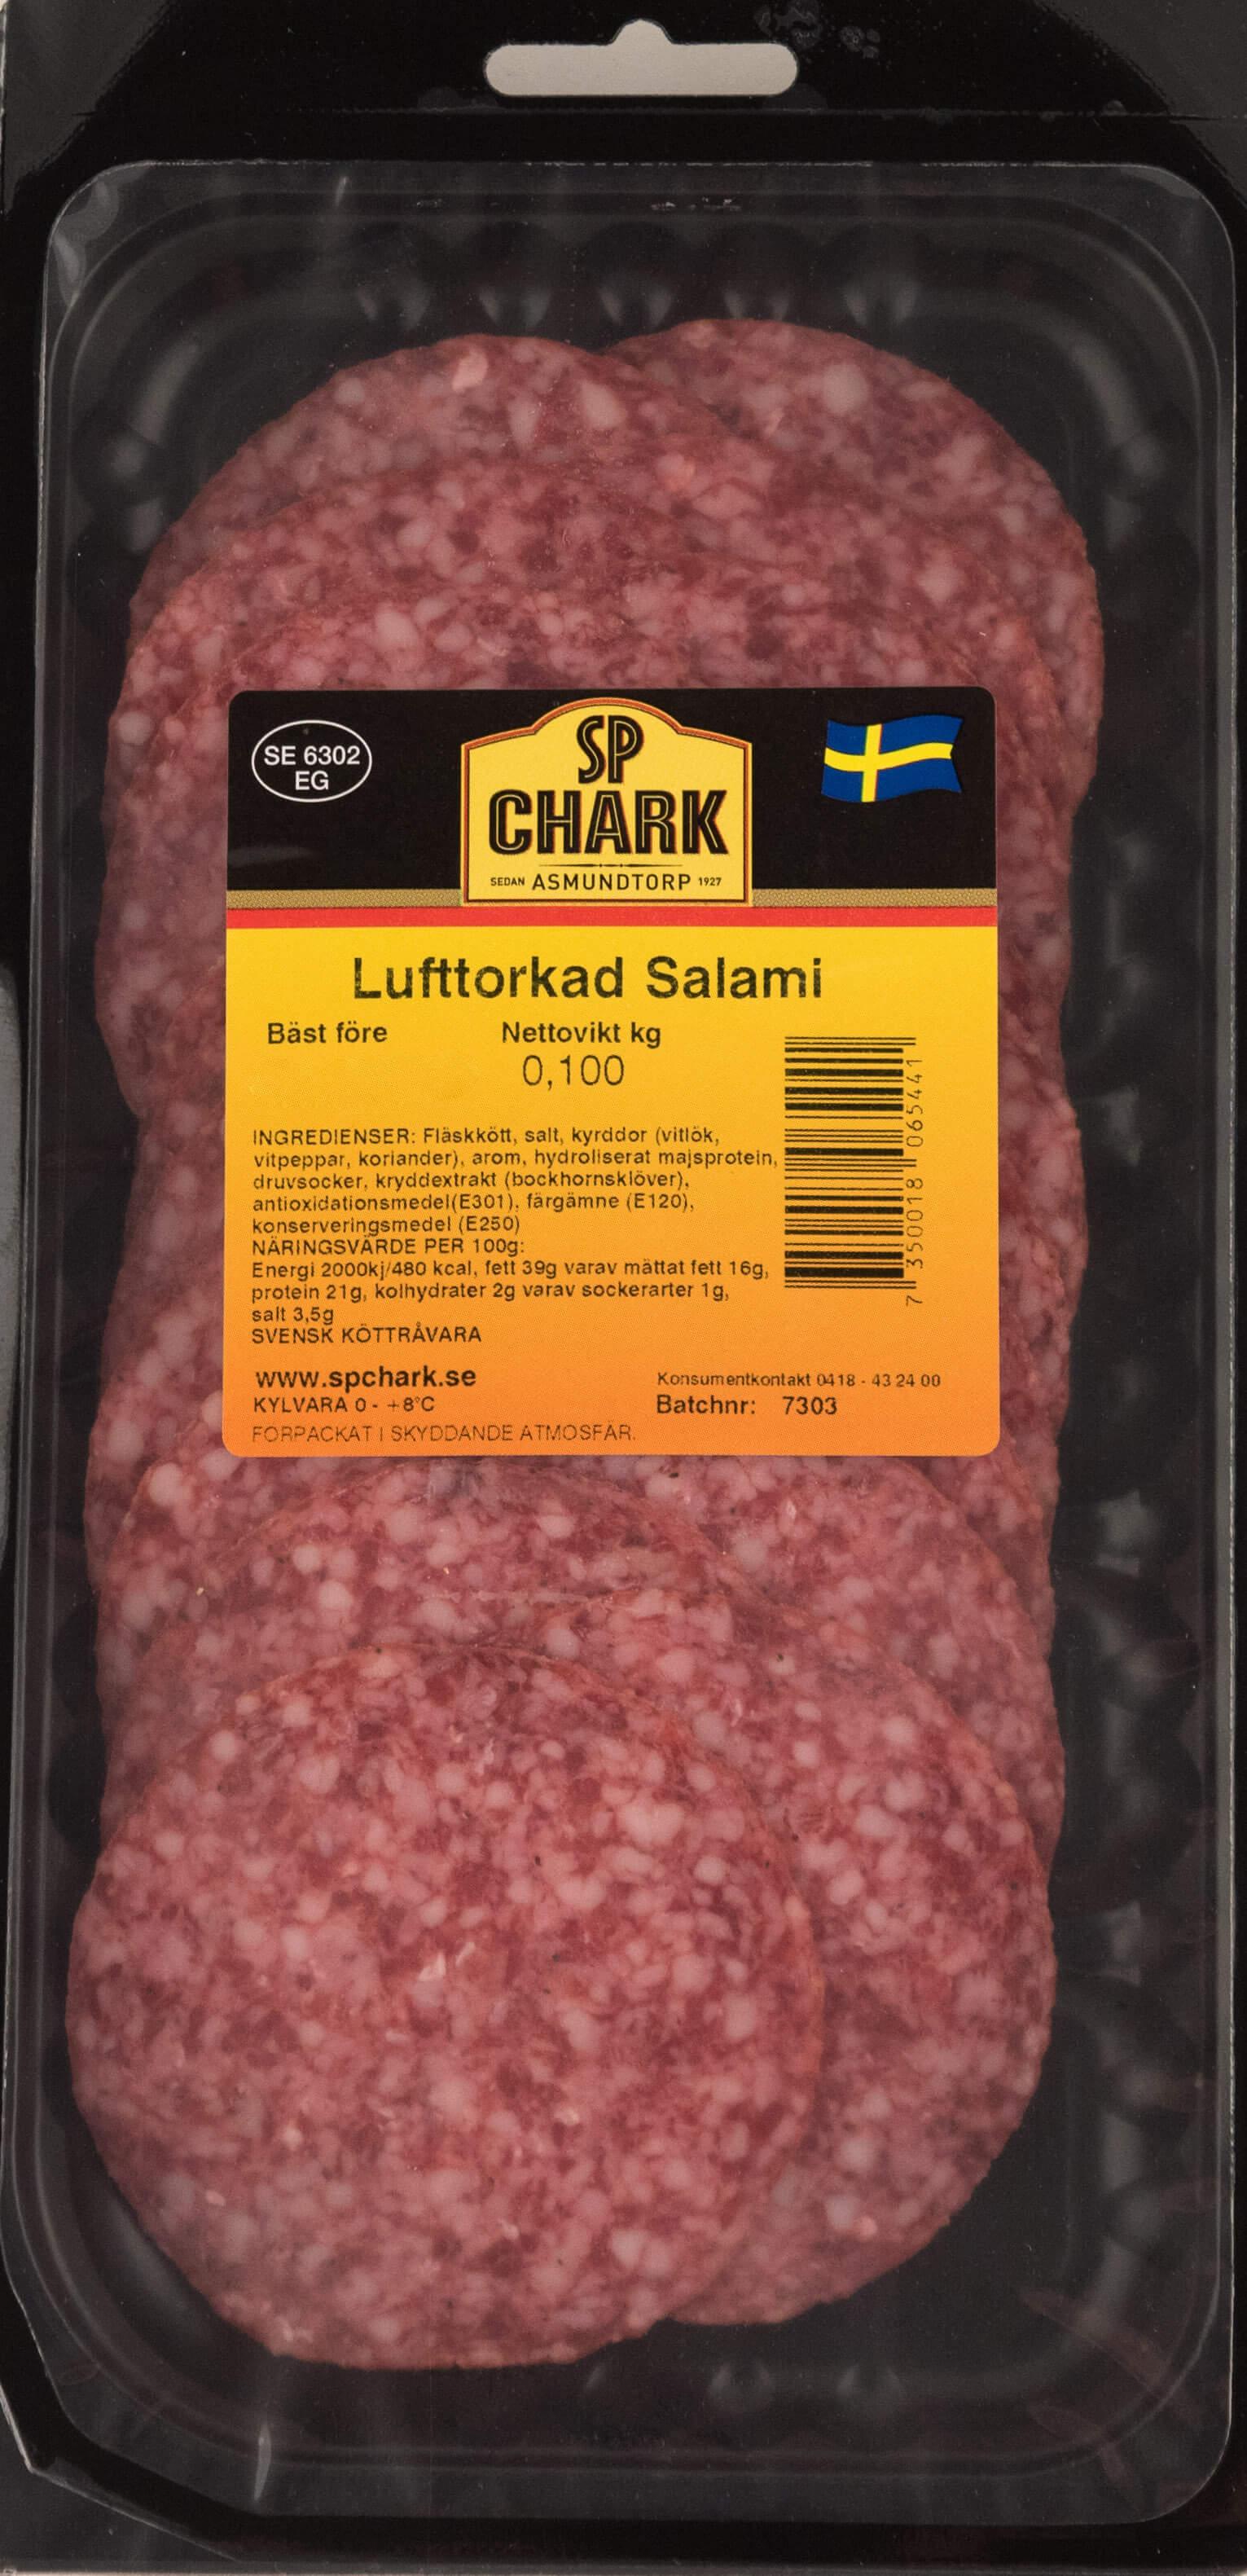 Lufttorkad salami